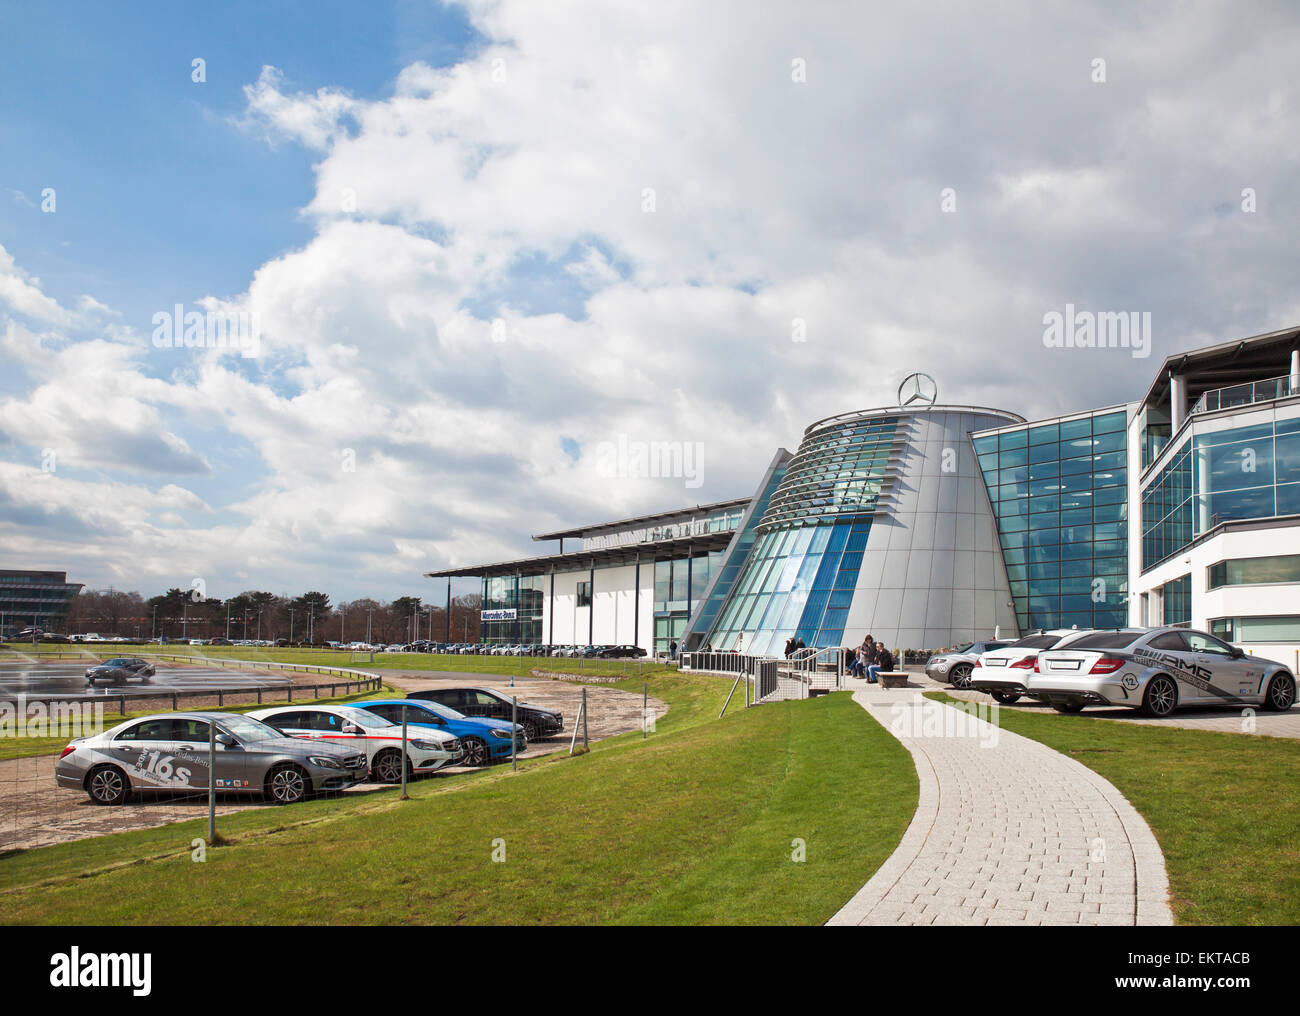 Mercedes benz world brooklands stock photo royalty free for Mercedes benz worldwide